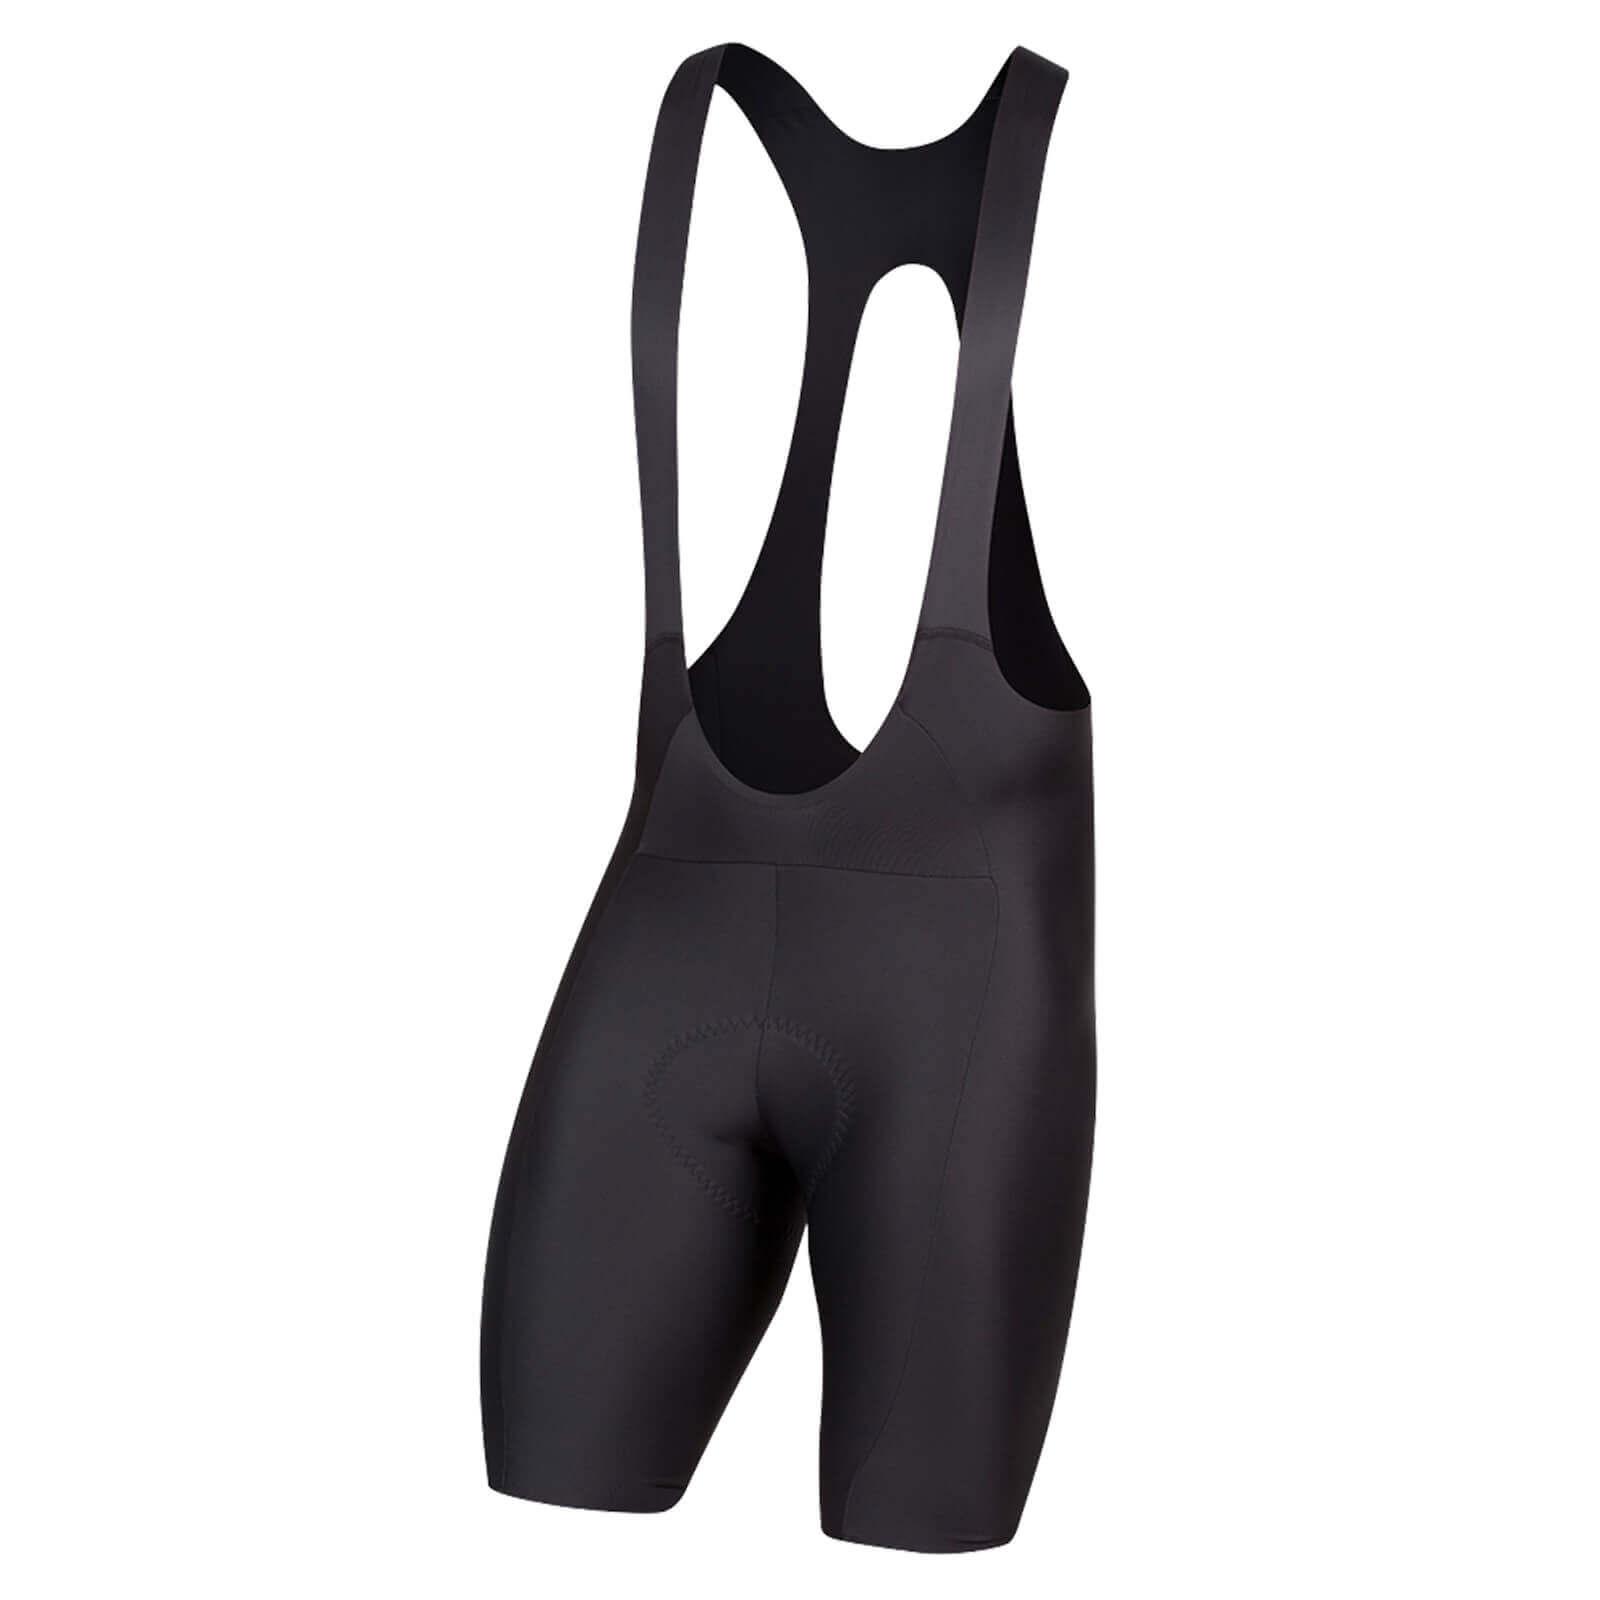 Pearl Izumi Pro Bib Shorts - M - Black